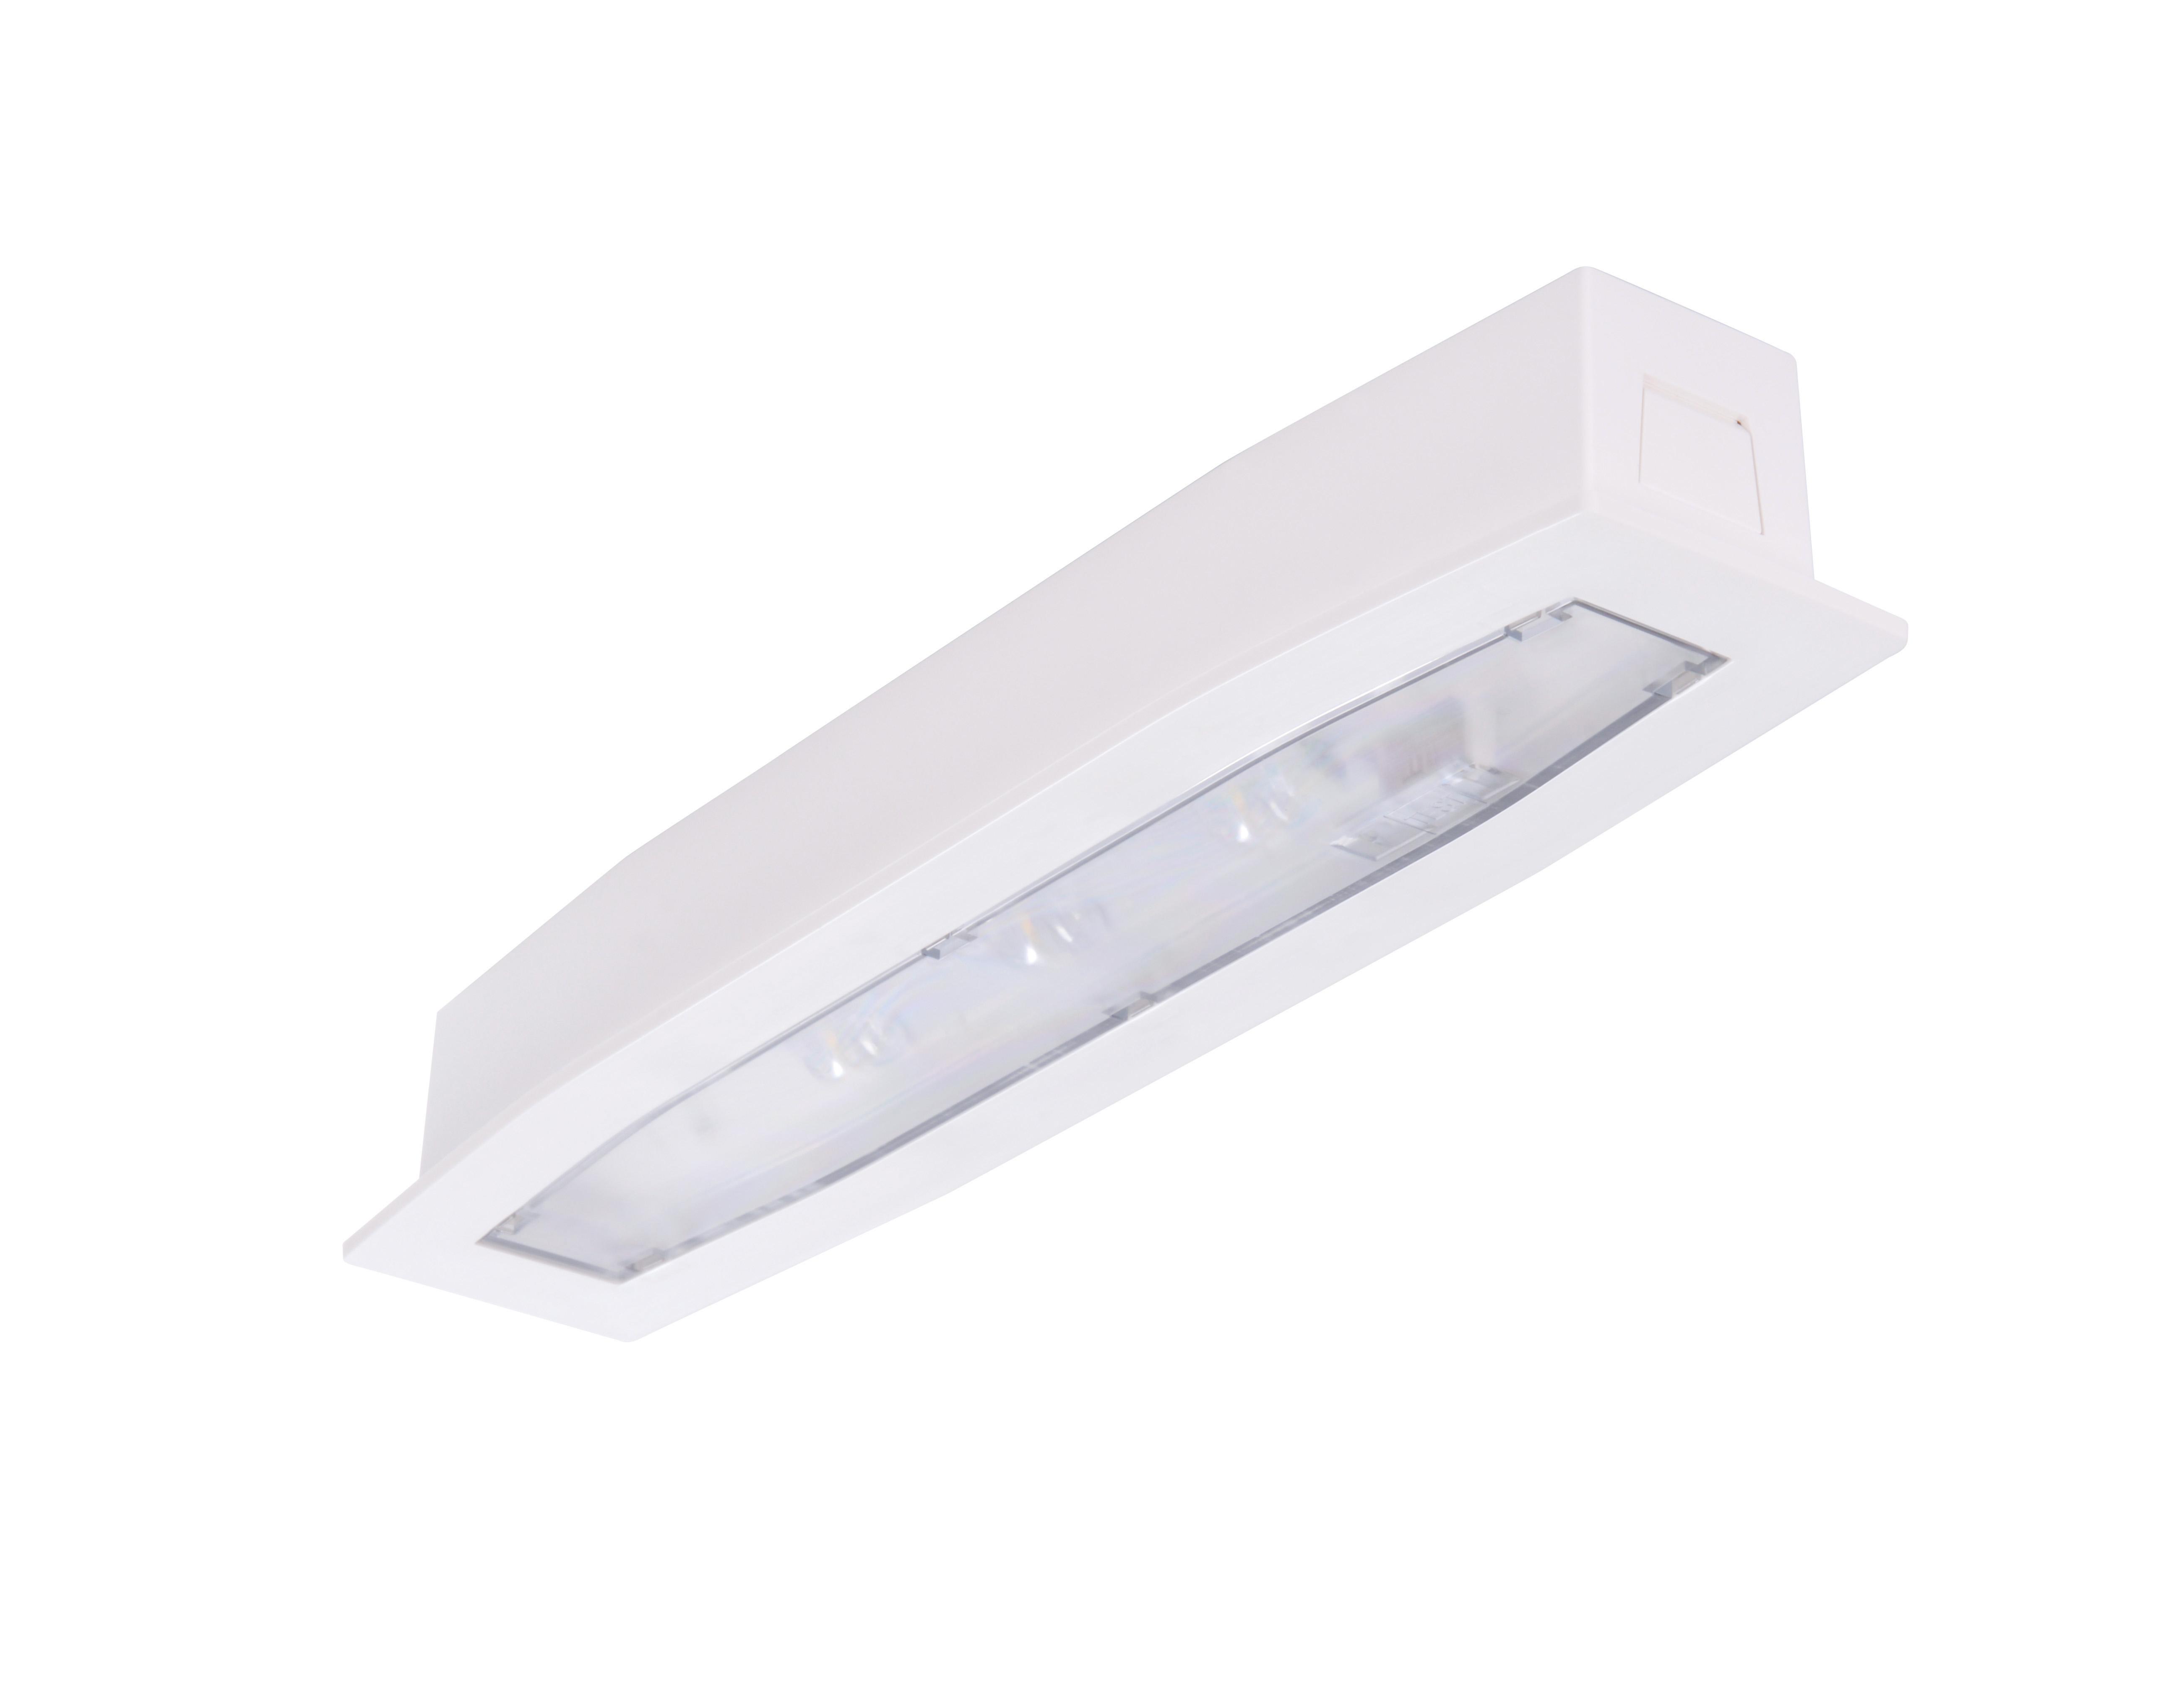 EOL Lampa antipanica led Intelight 94502   3h mentinut test automat [3]